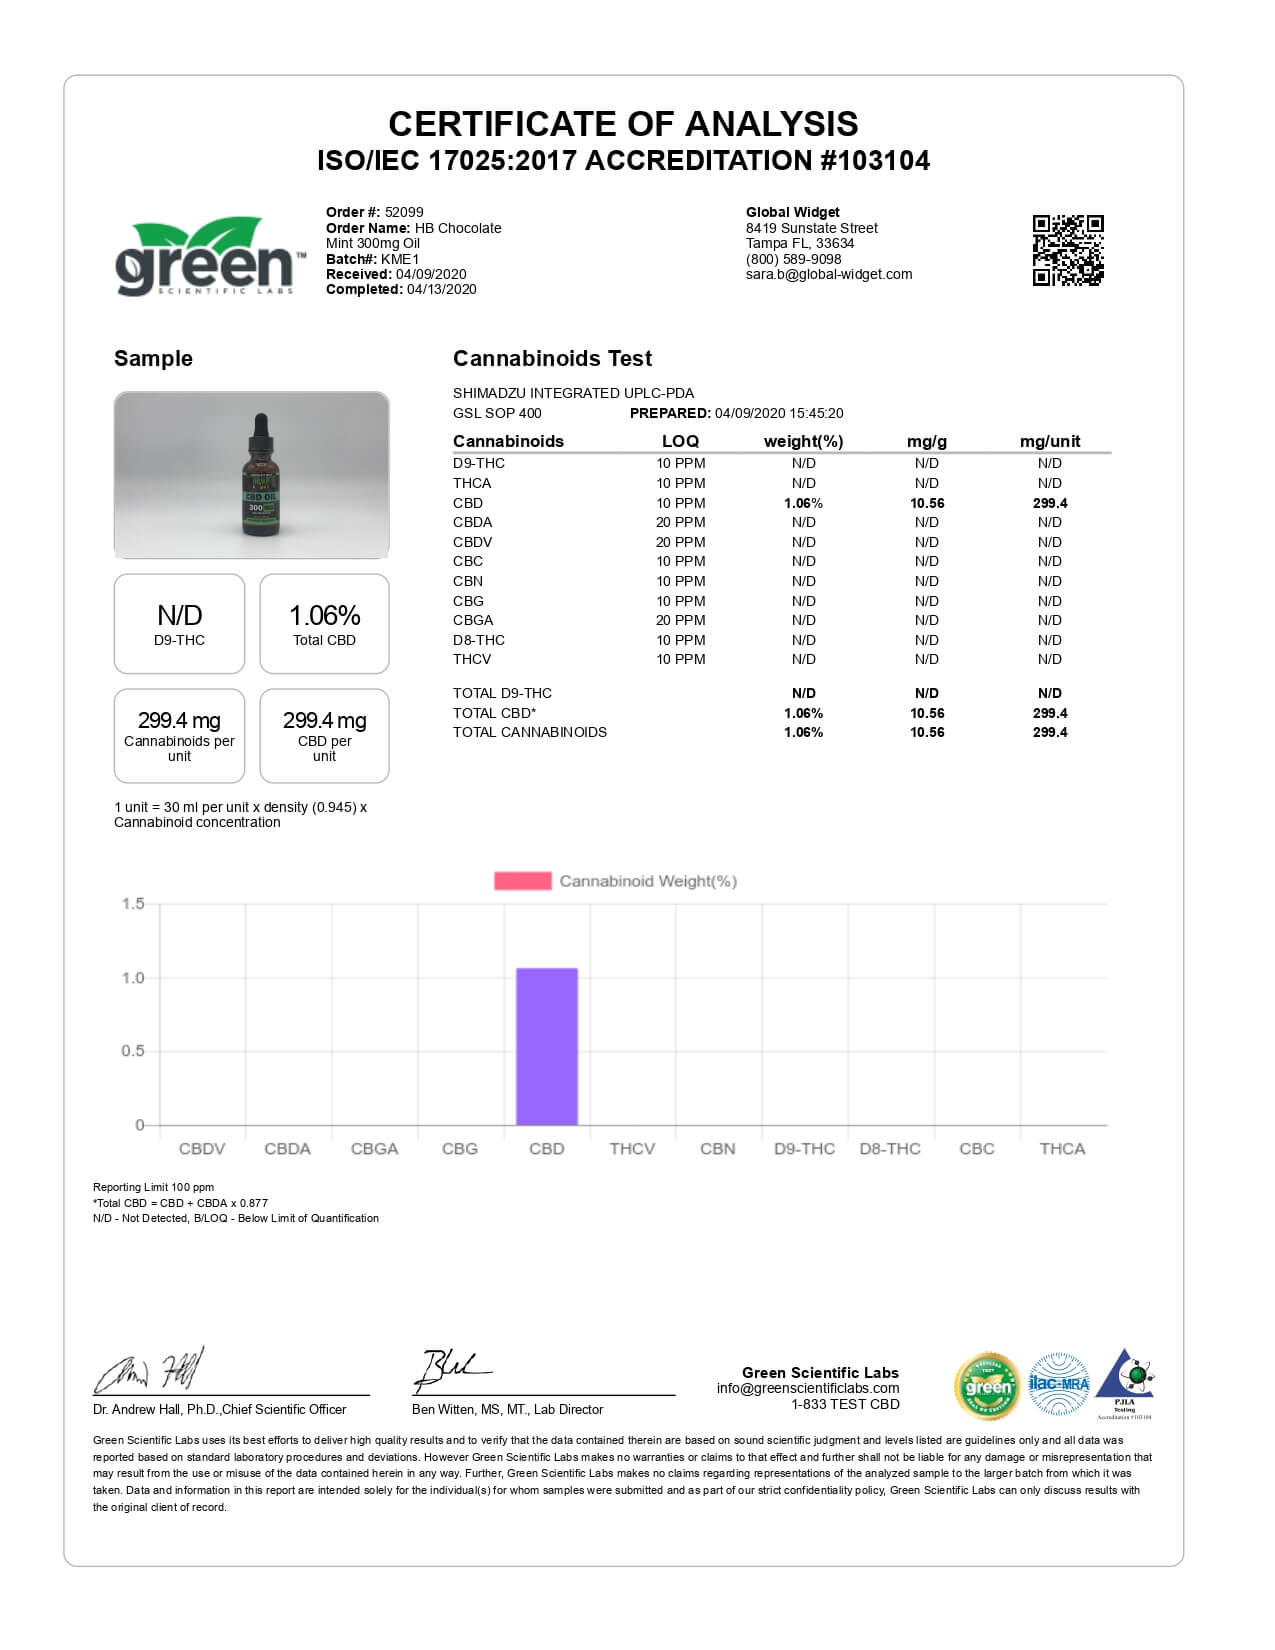 Hemp Bombs CBD Tincture Broad Spectrum Chocolate Mint Oil 300mg Lab Report